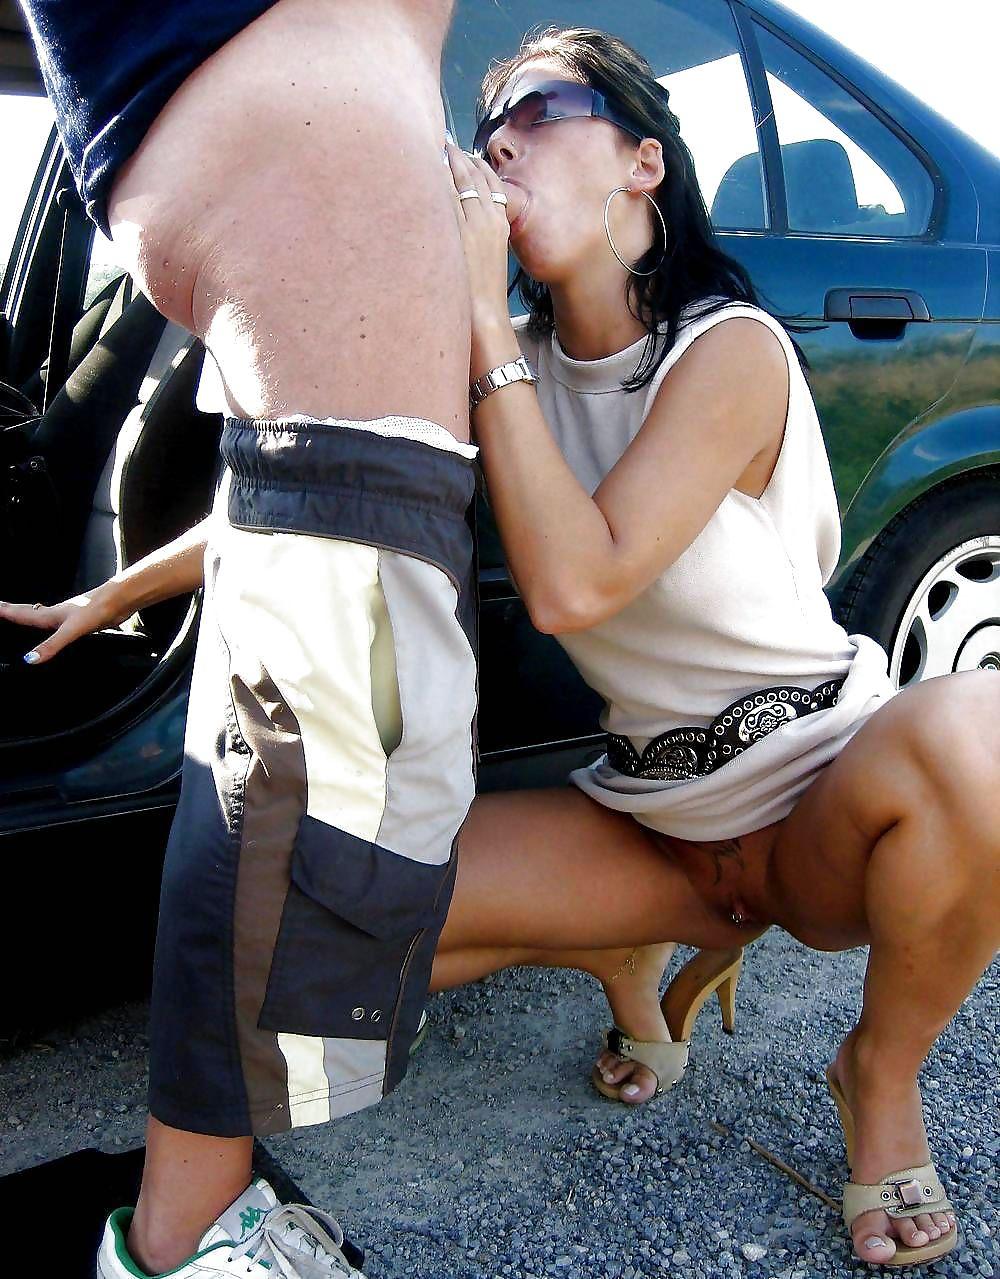 подборка домашнего секса на улице - 13